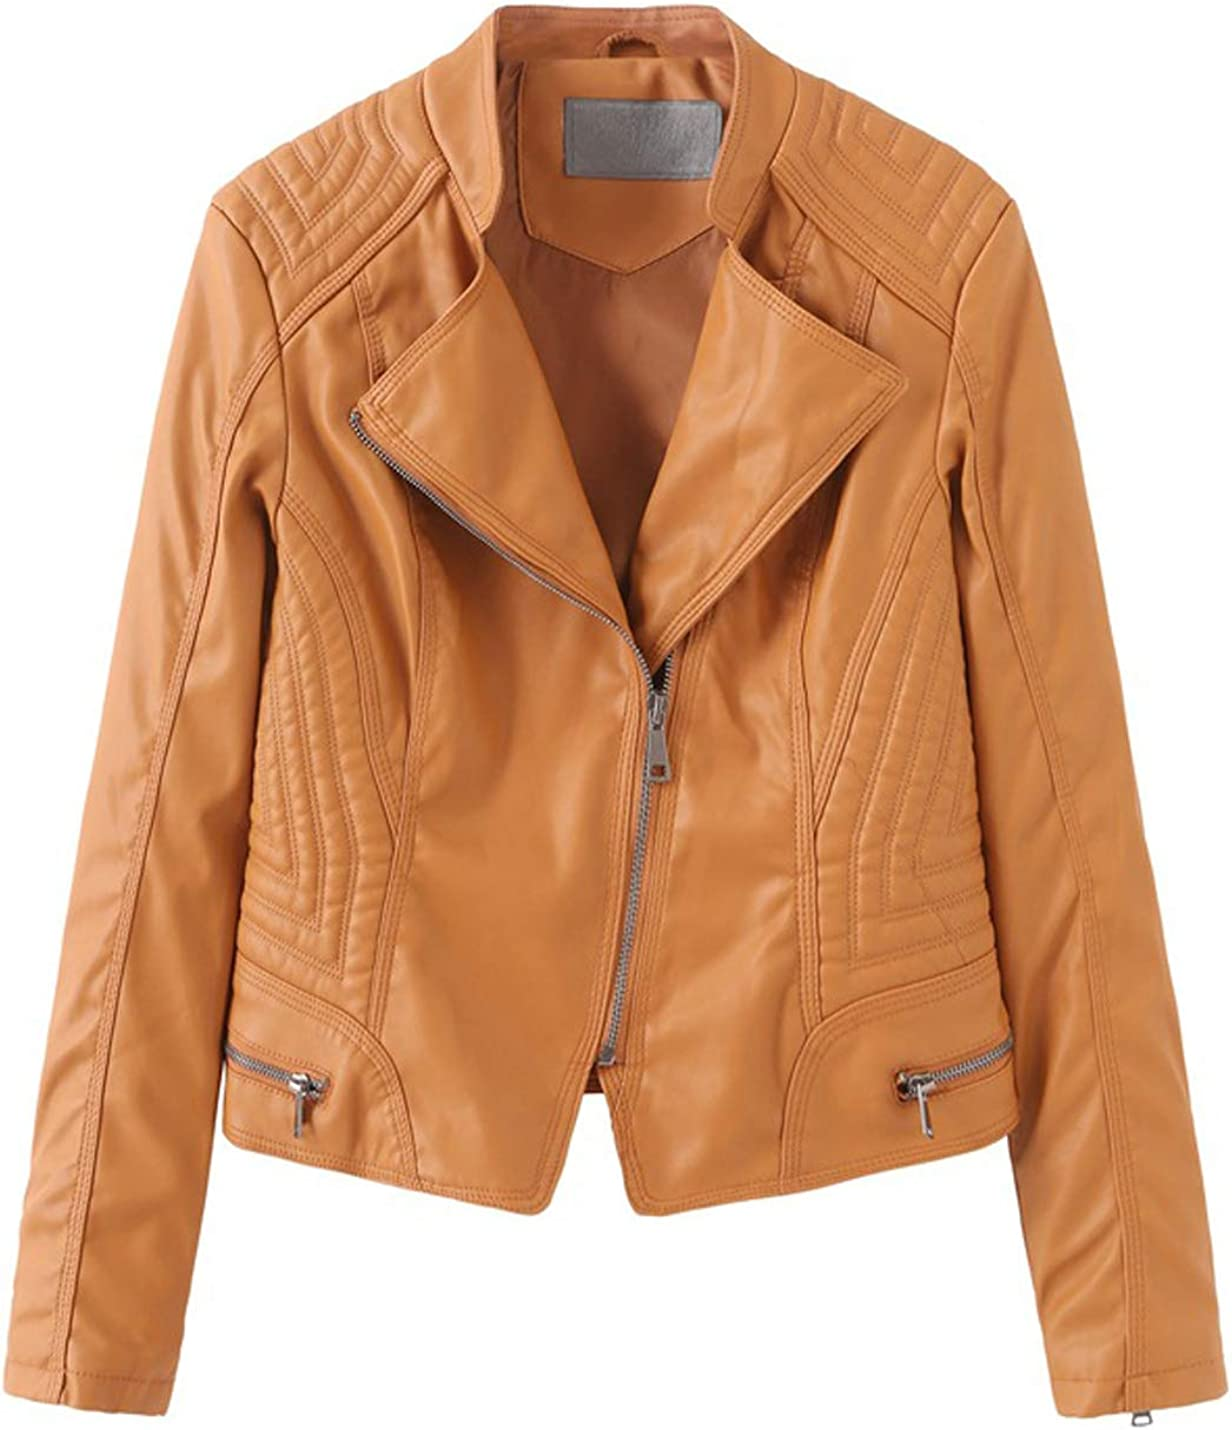 Gihuo Women's Crop Leather Jacket PU Biker Motorcycle Jackets